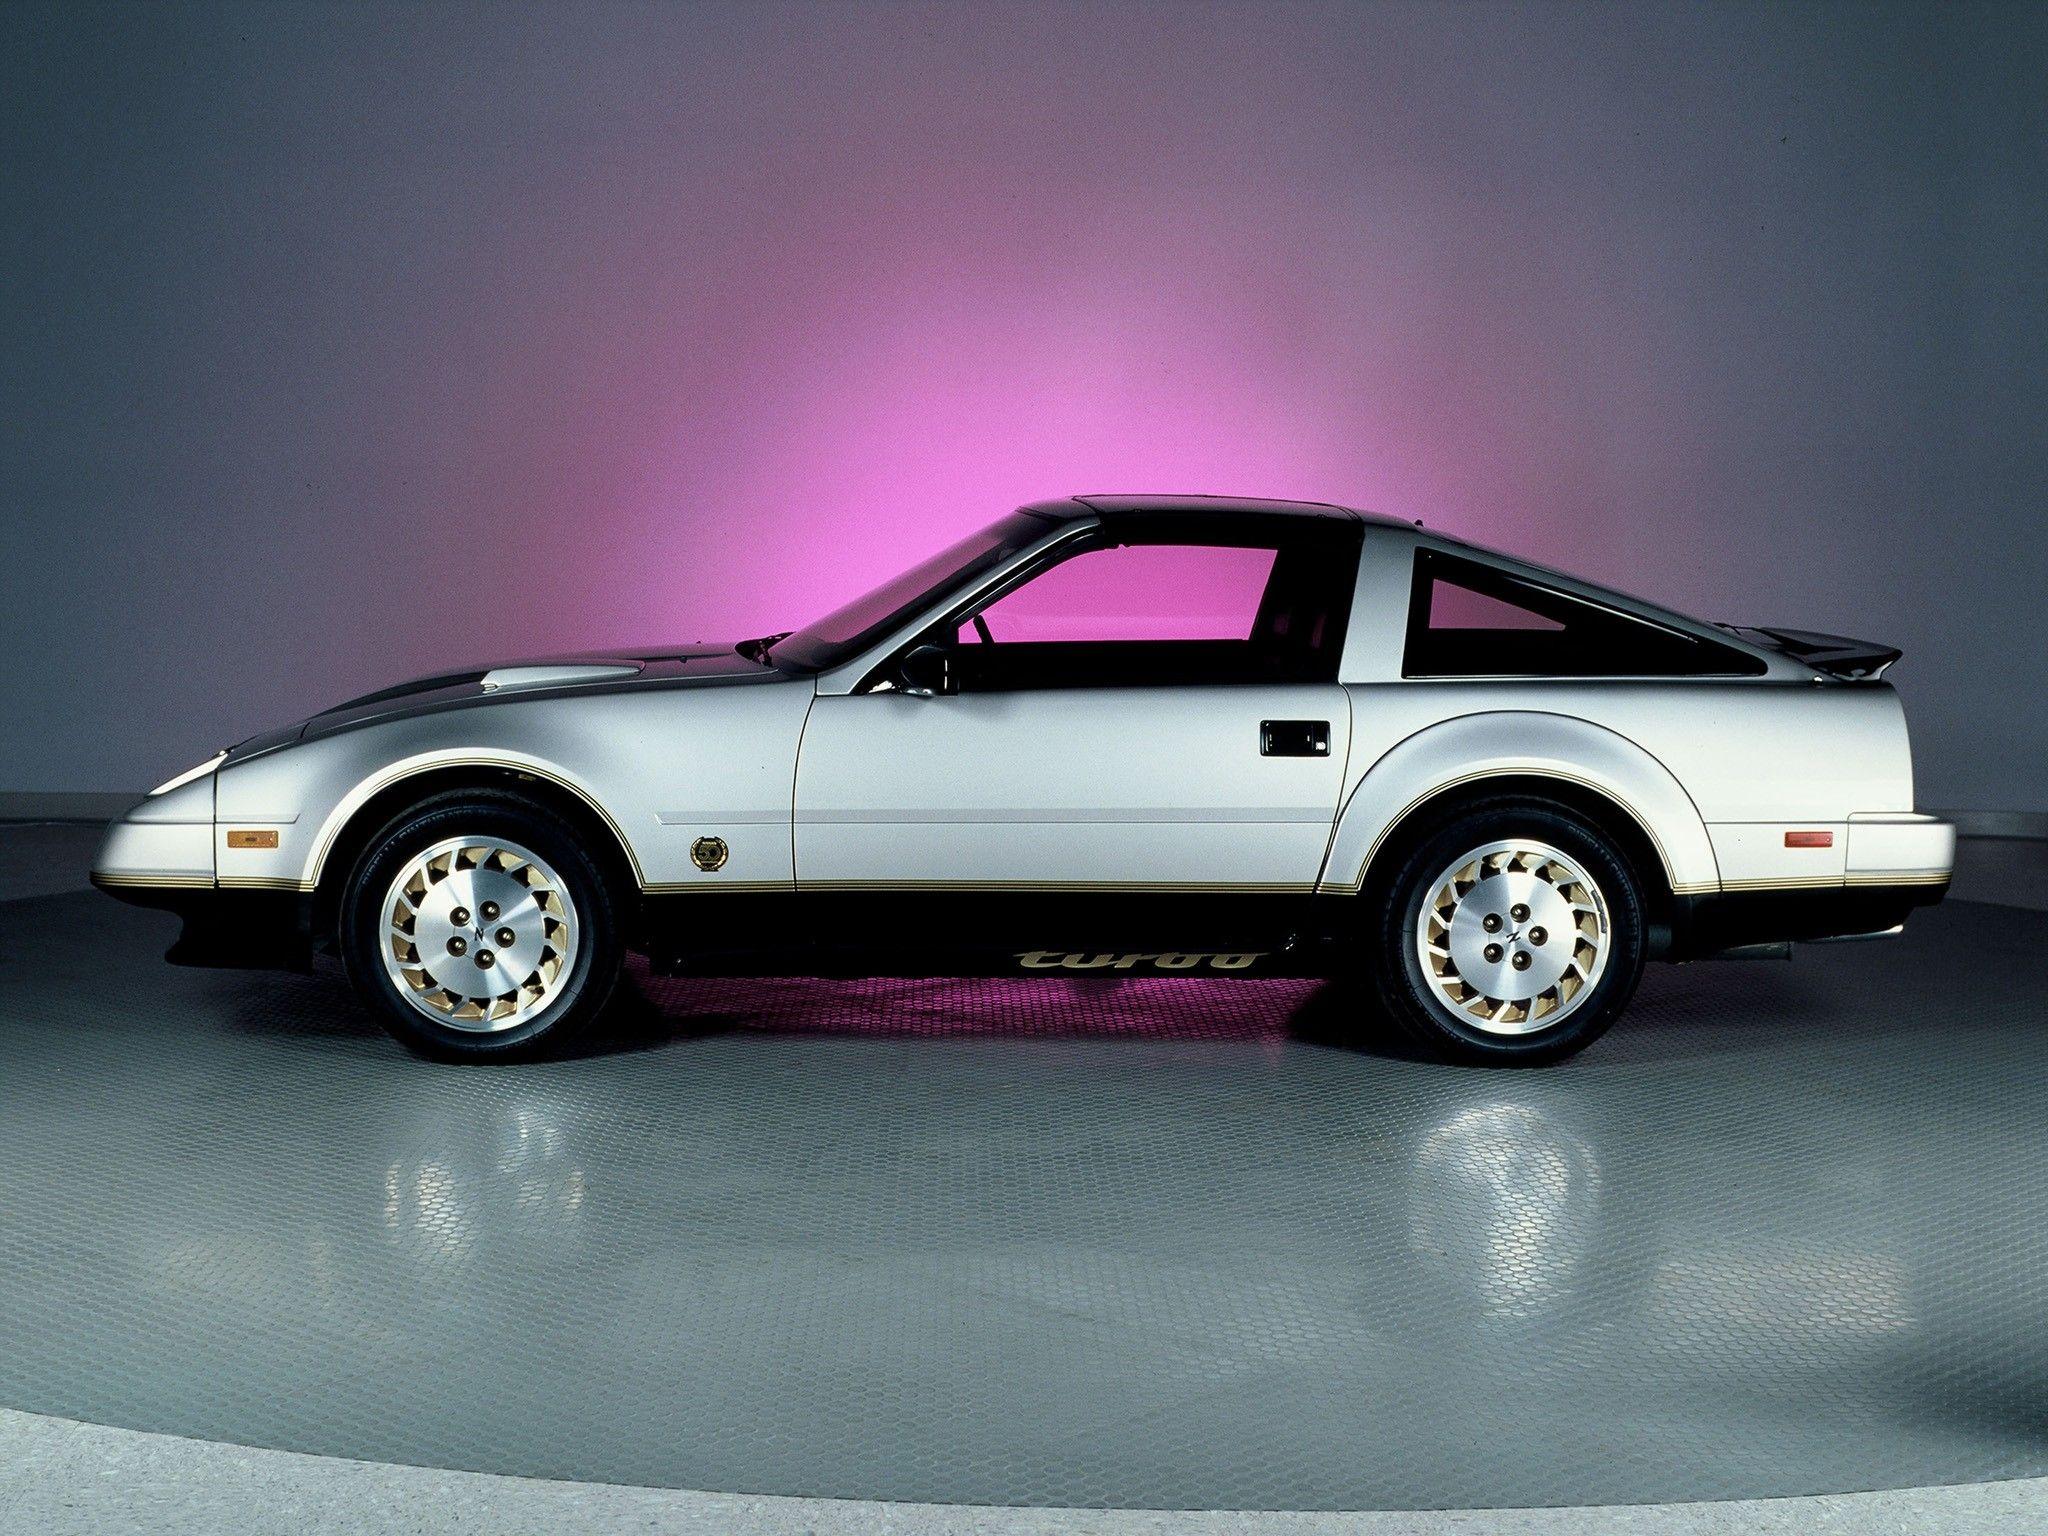 Nissan 300 zx 1984 1985 1986 1987 1988 1989